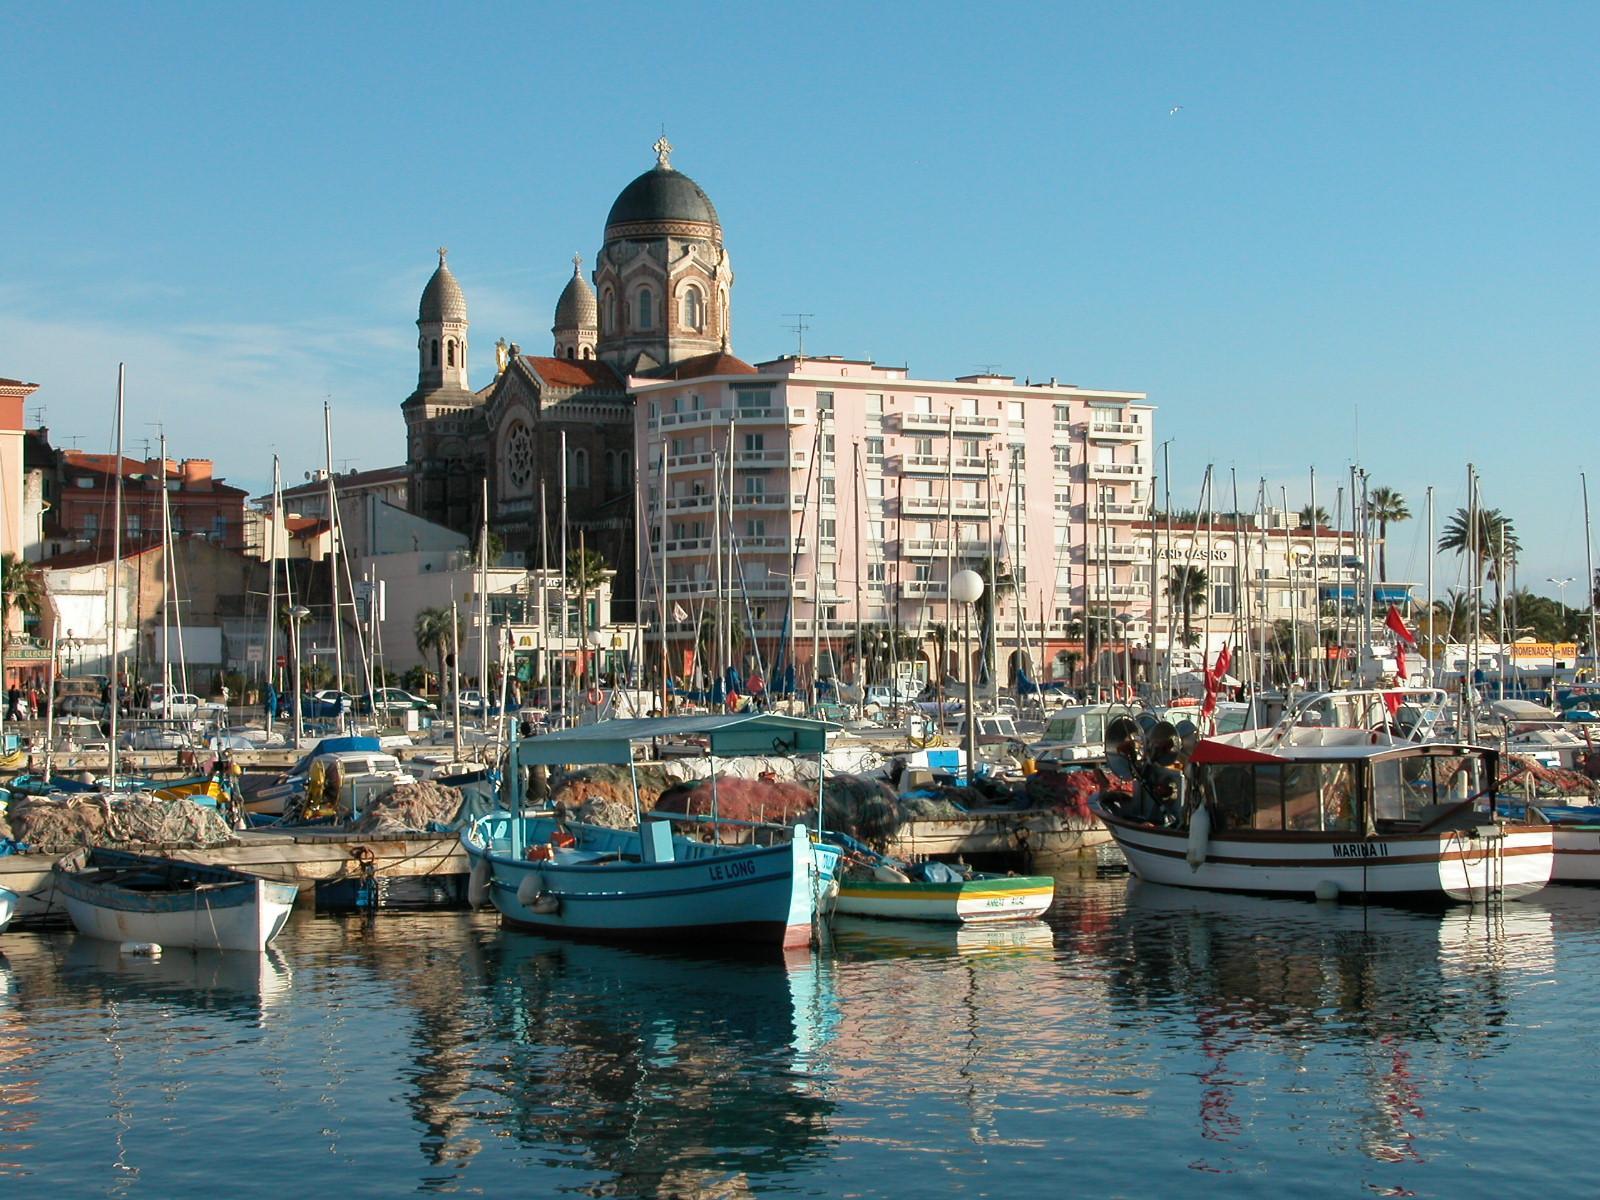 Noleggio Barche St. Raphael - Navalia | Noleggia un Sogno